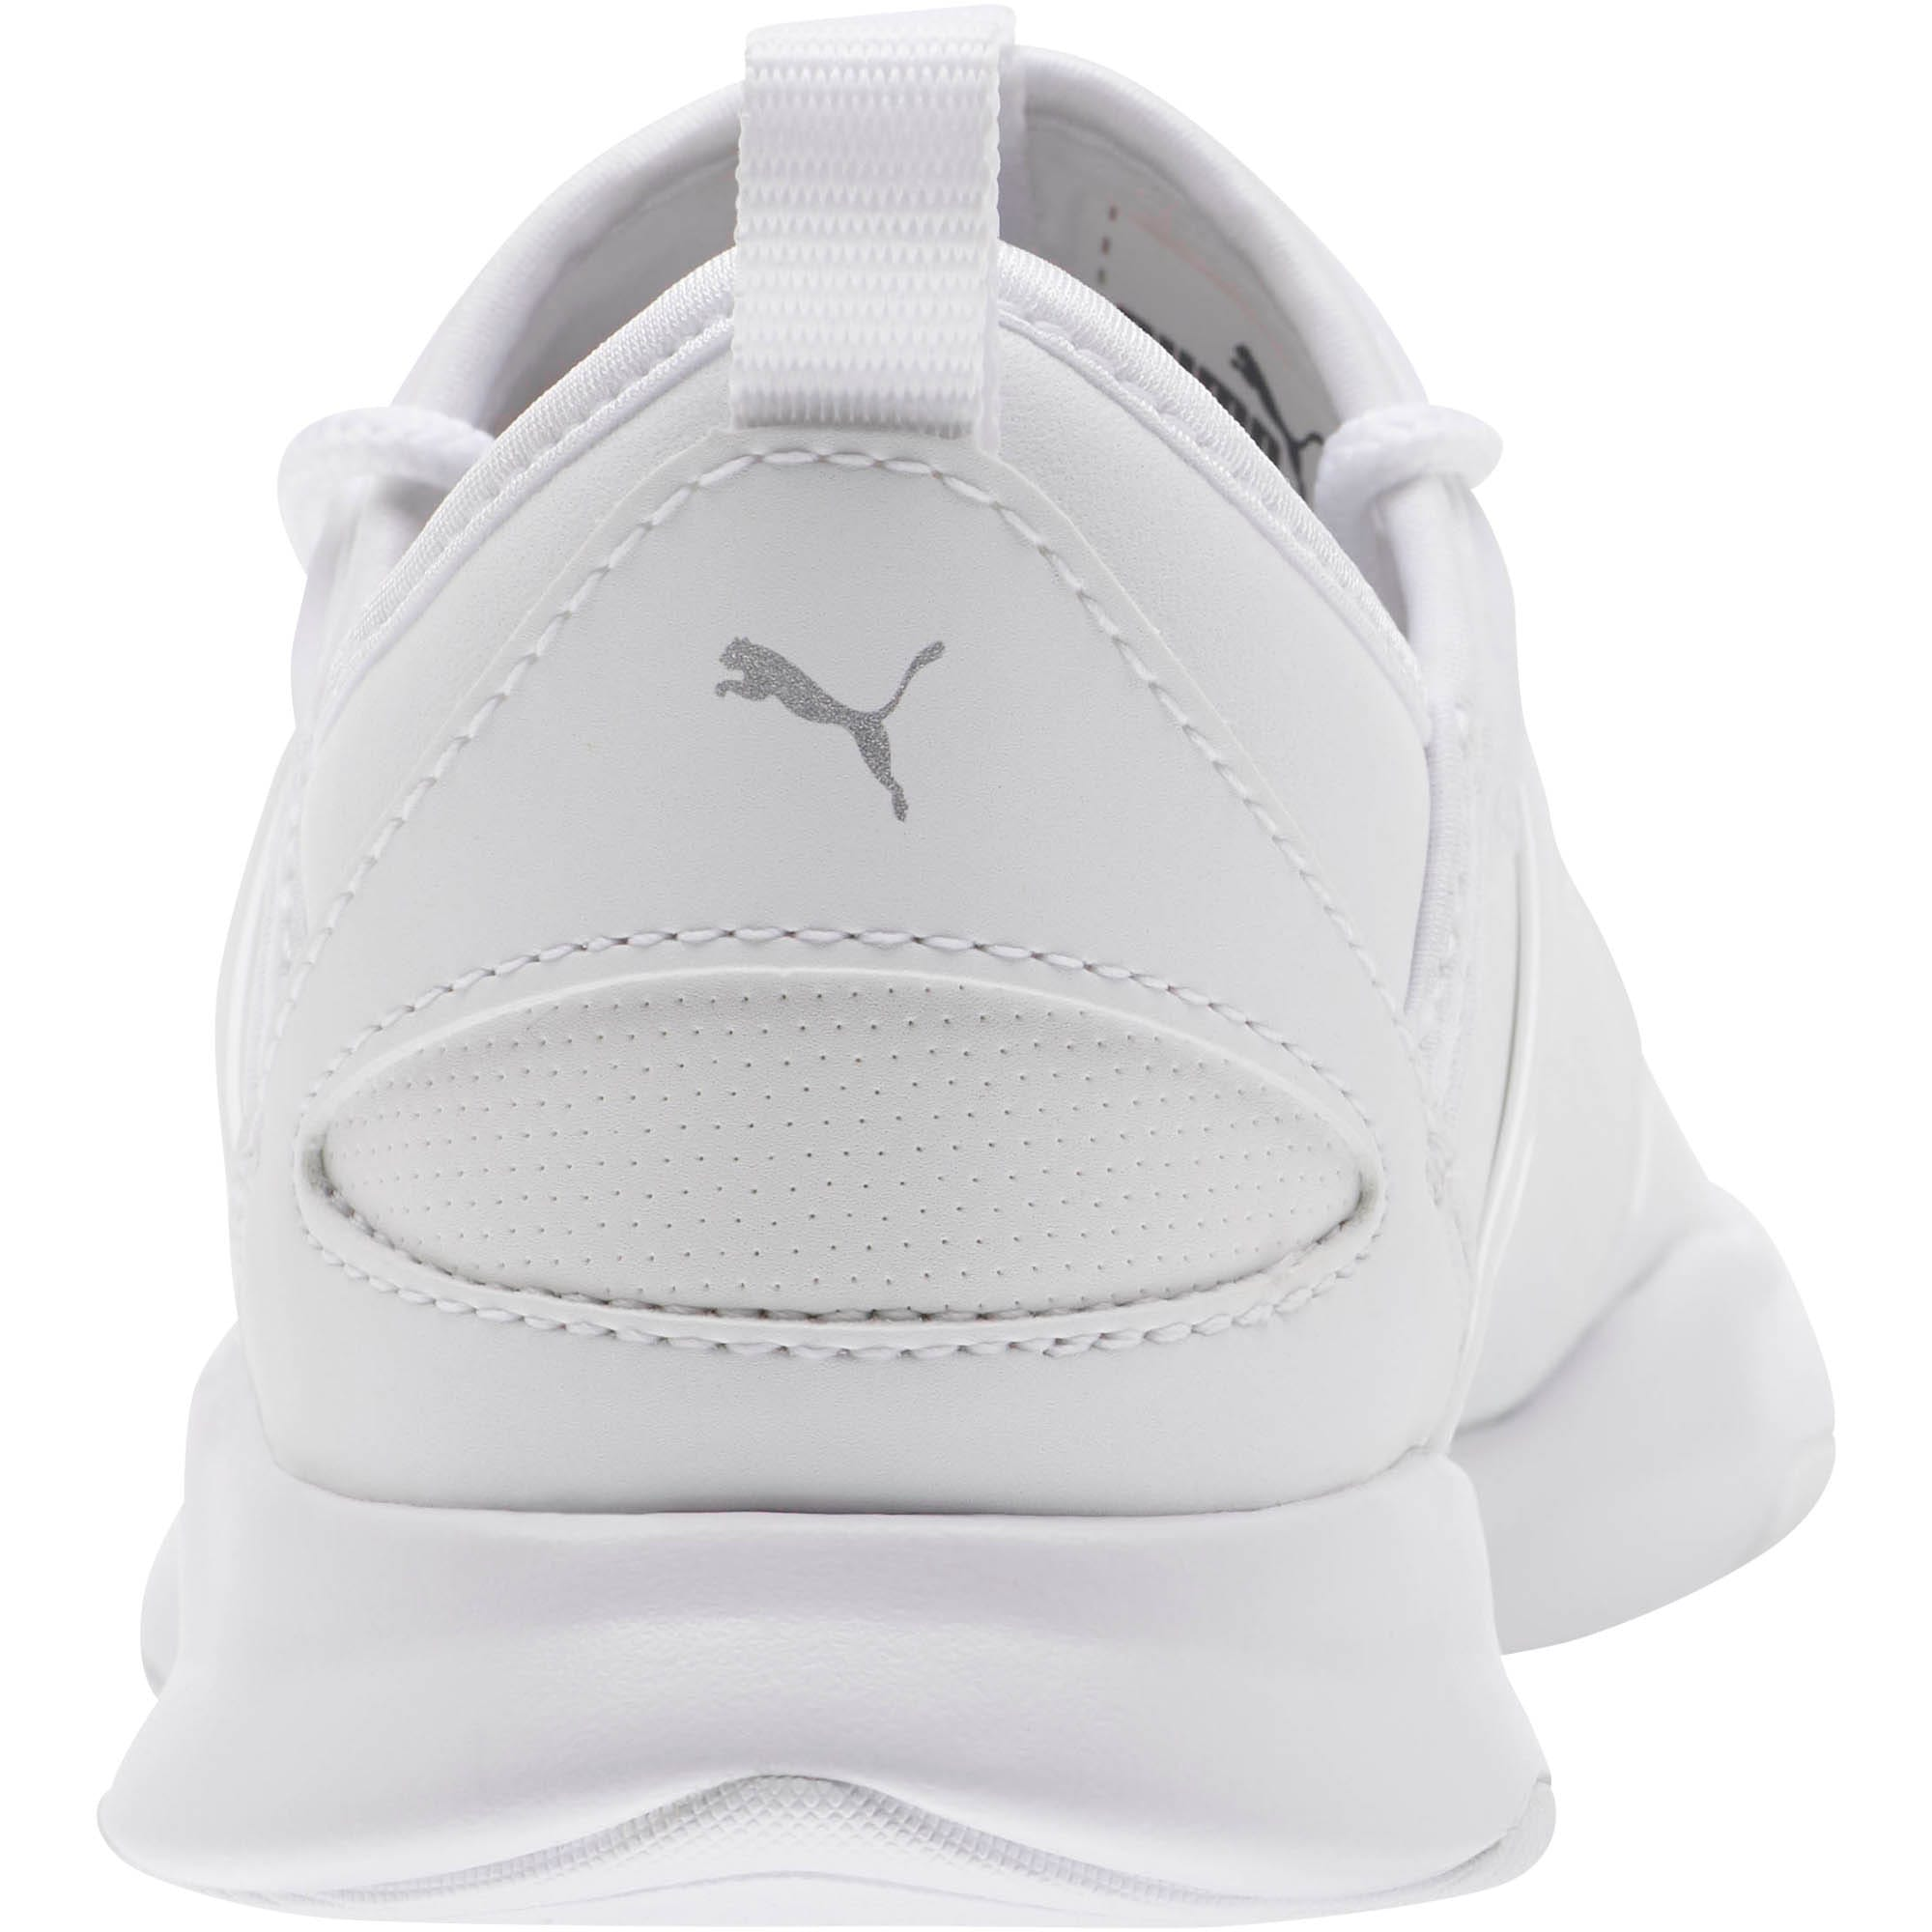 Thumbnail 3 of PUMA Dare Lace Women's Sneakers, P. White-P. White-P. White, medium